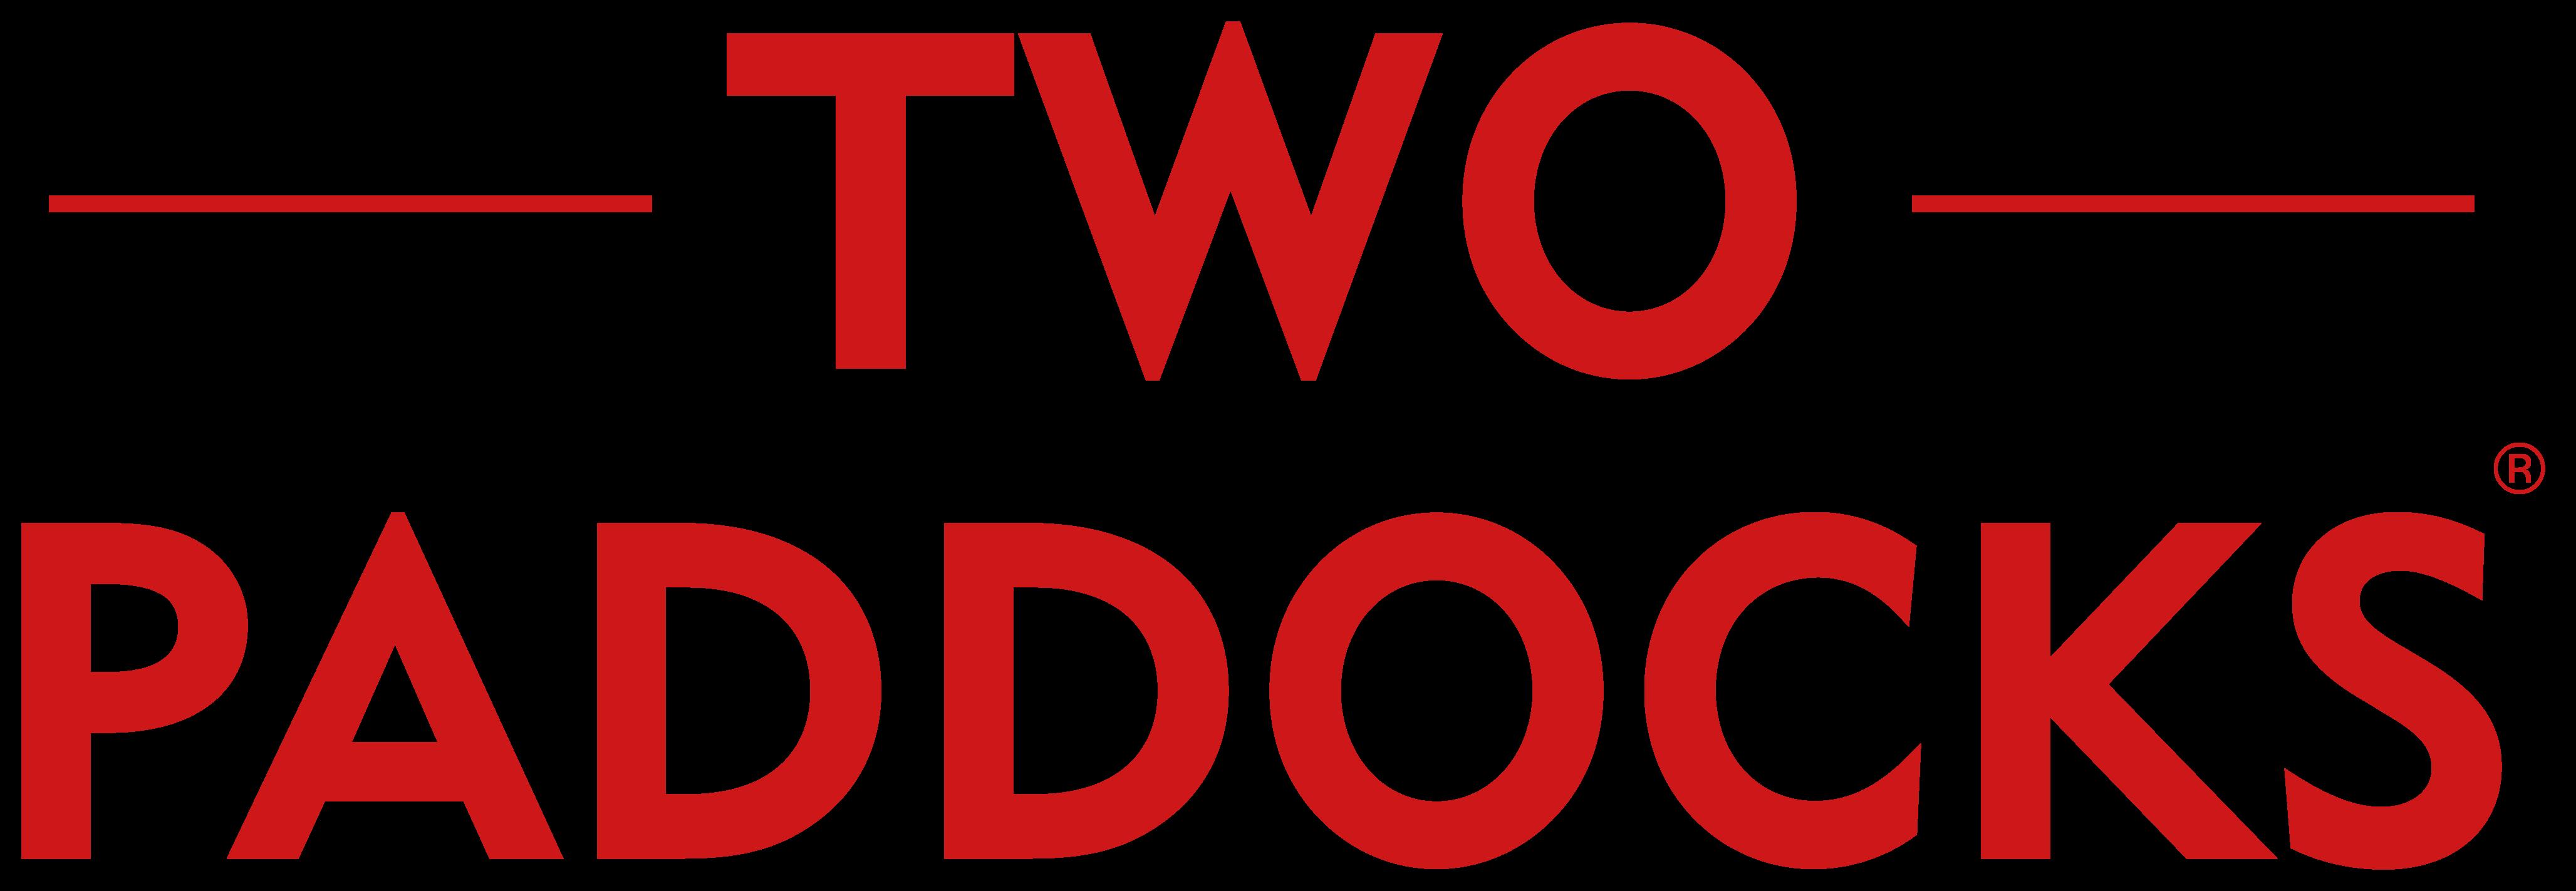 TWO PADDOCKS LOGO